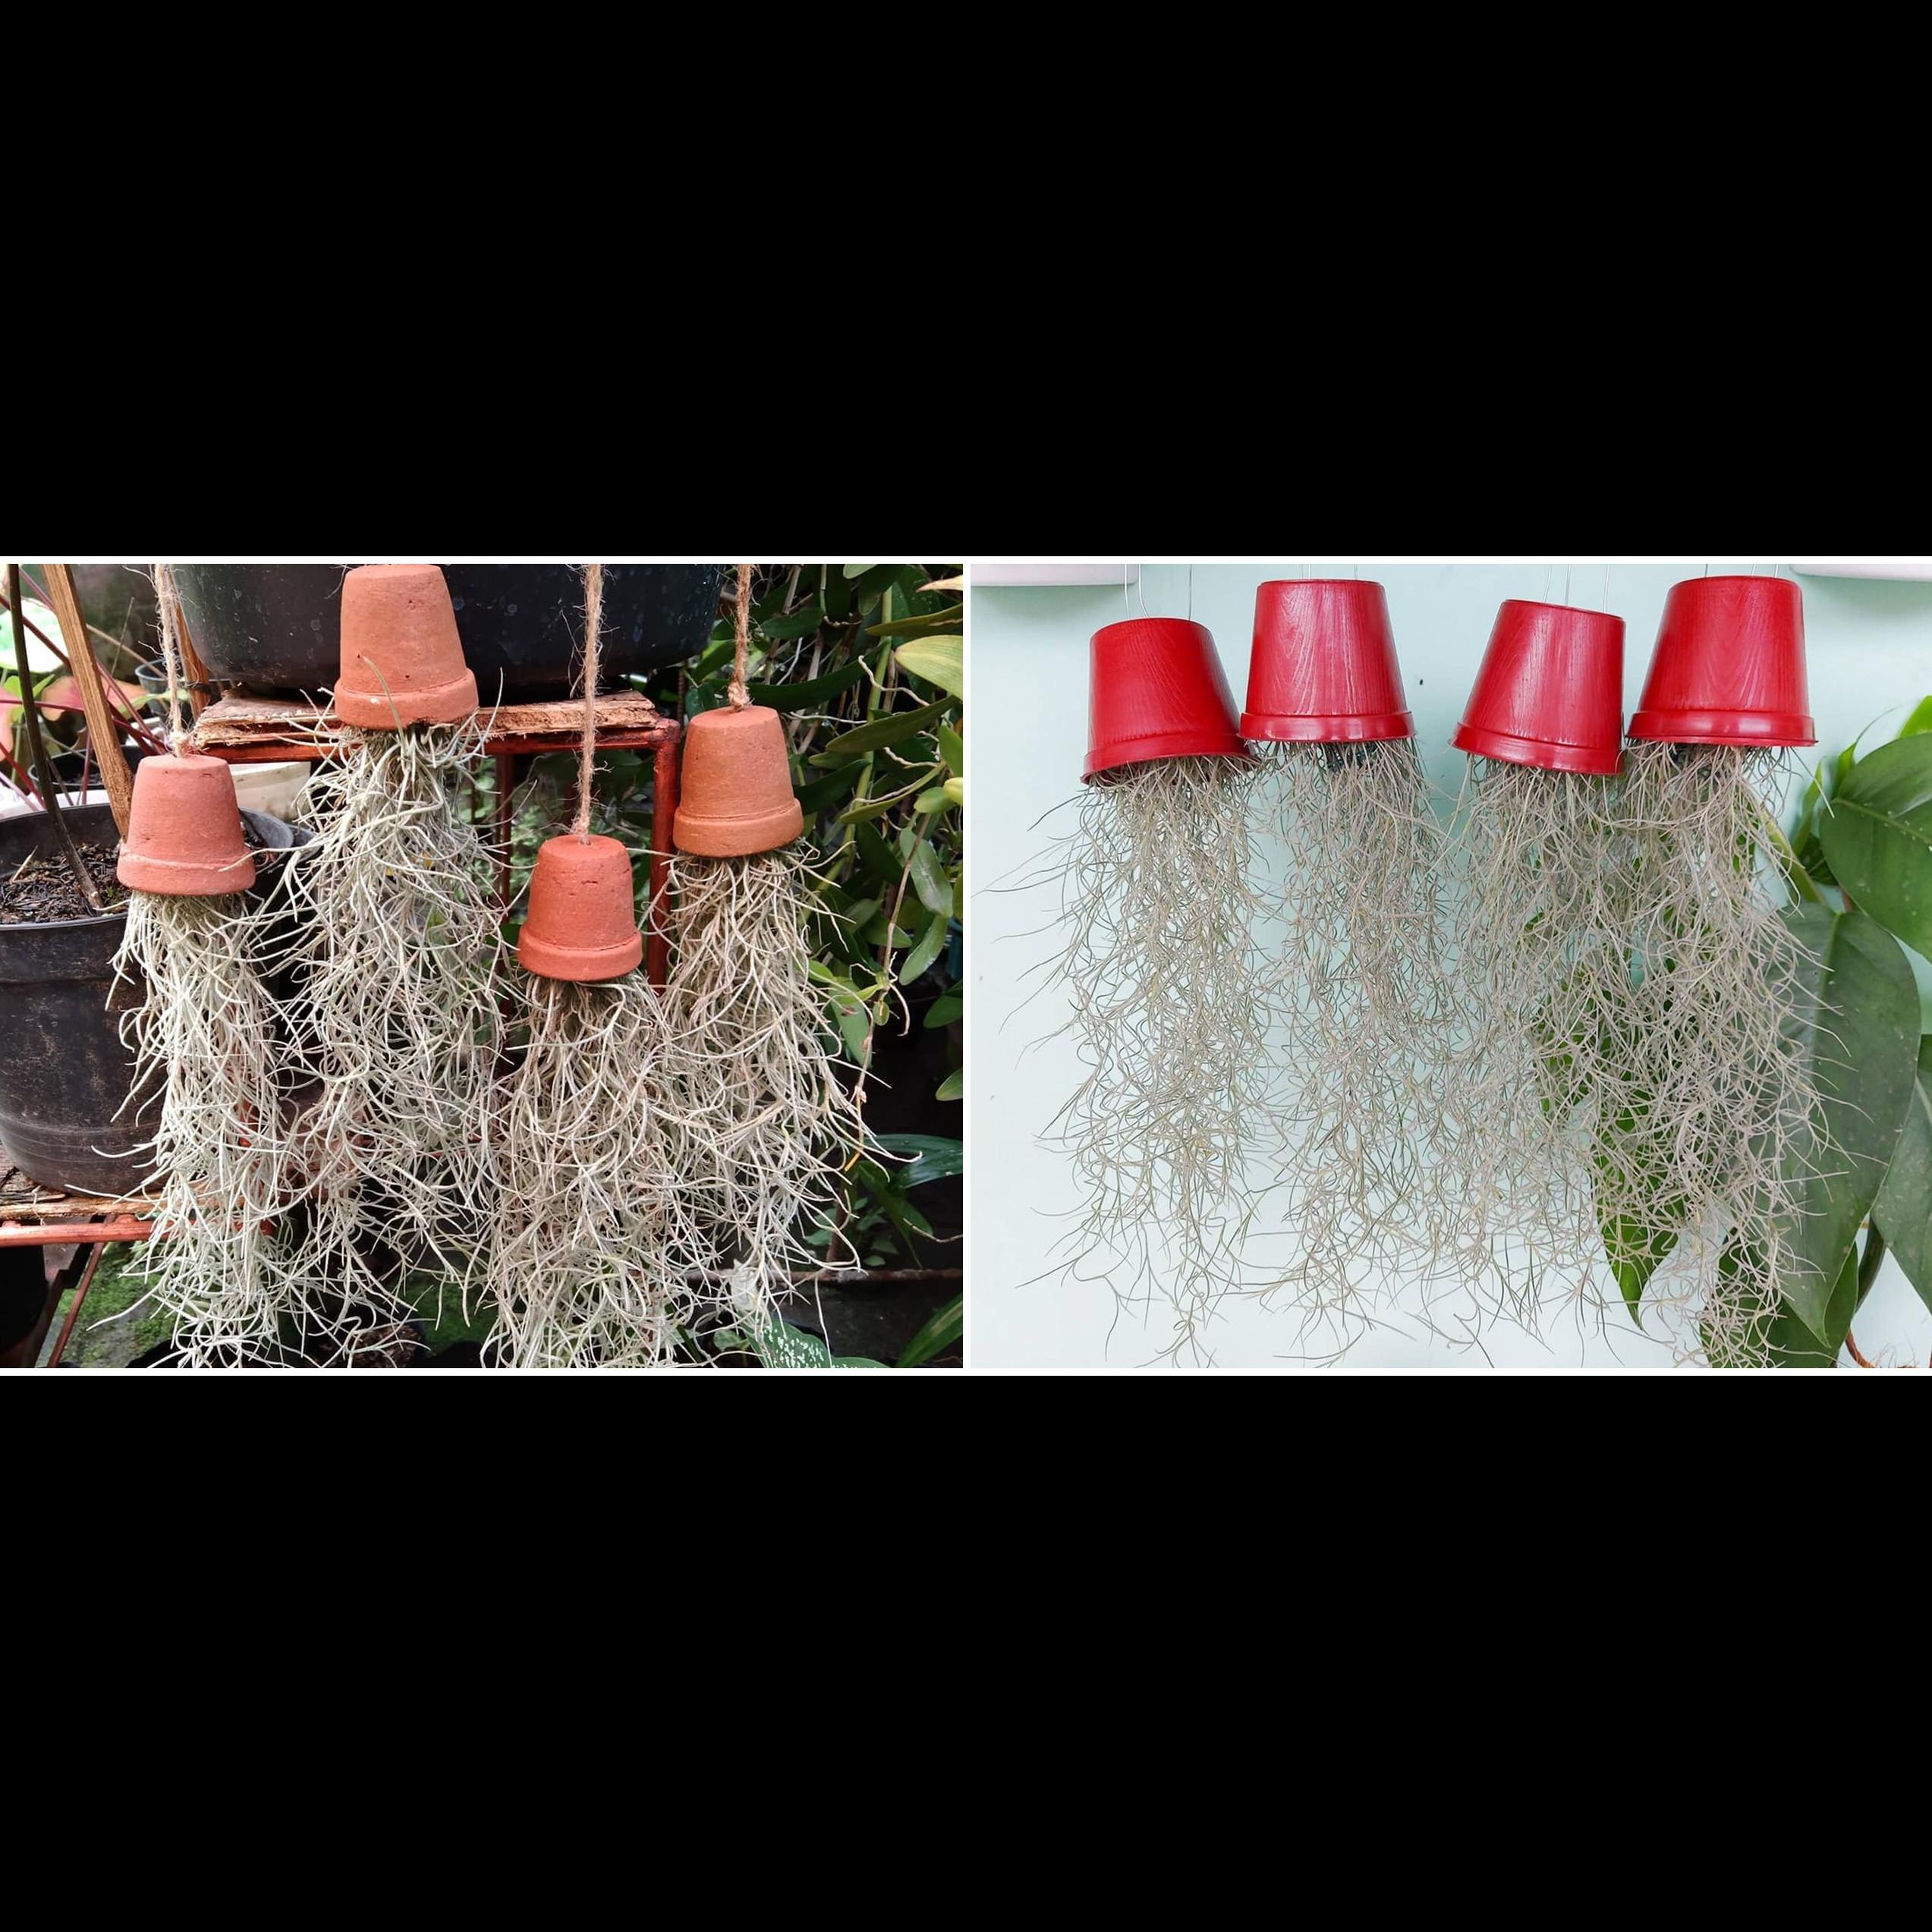 Cara merawat tanaman hias gantung jenggot musa, unik dan mudah